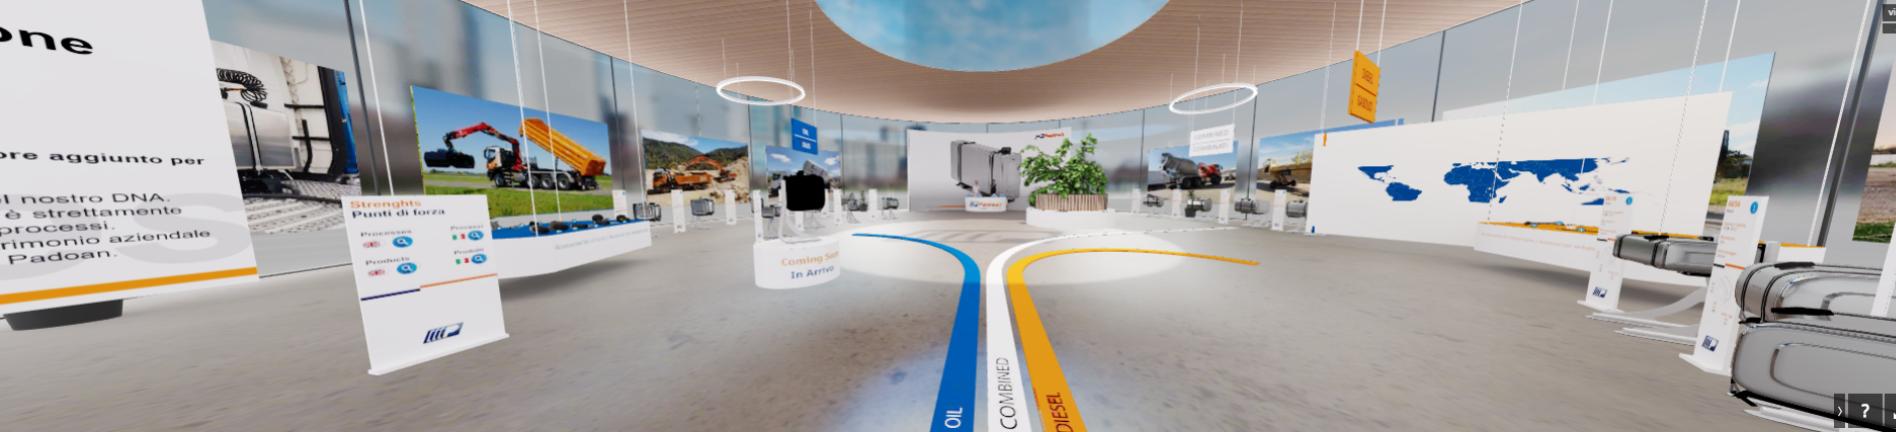 NEWS - The new Padoan's Virtual showroom is online